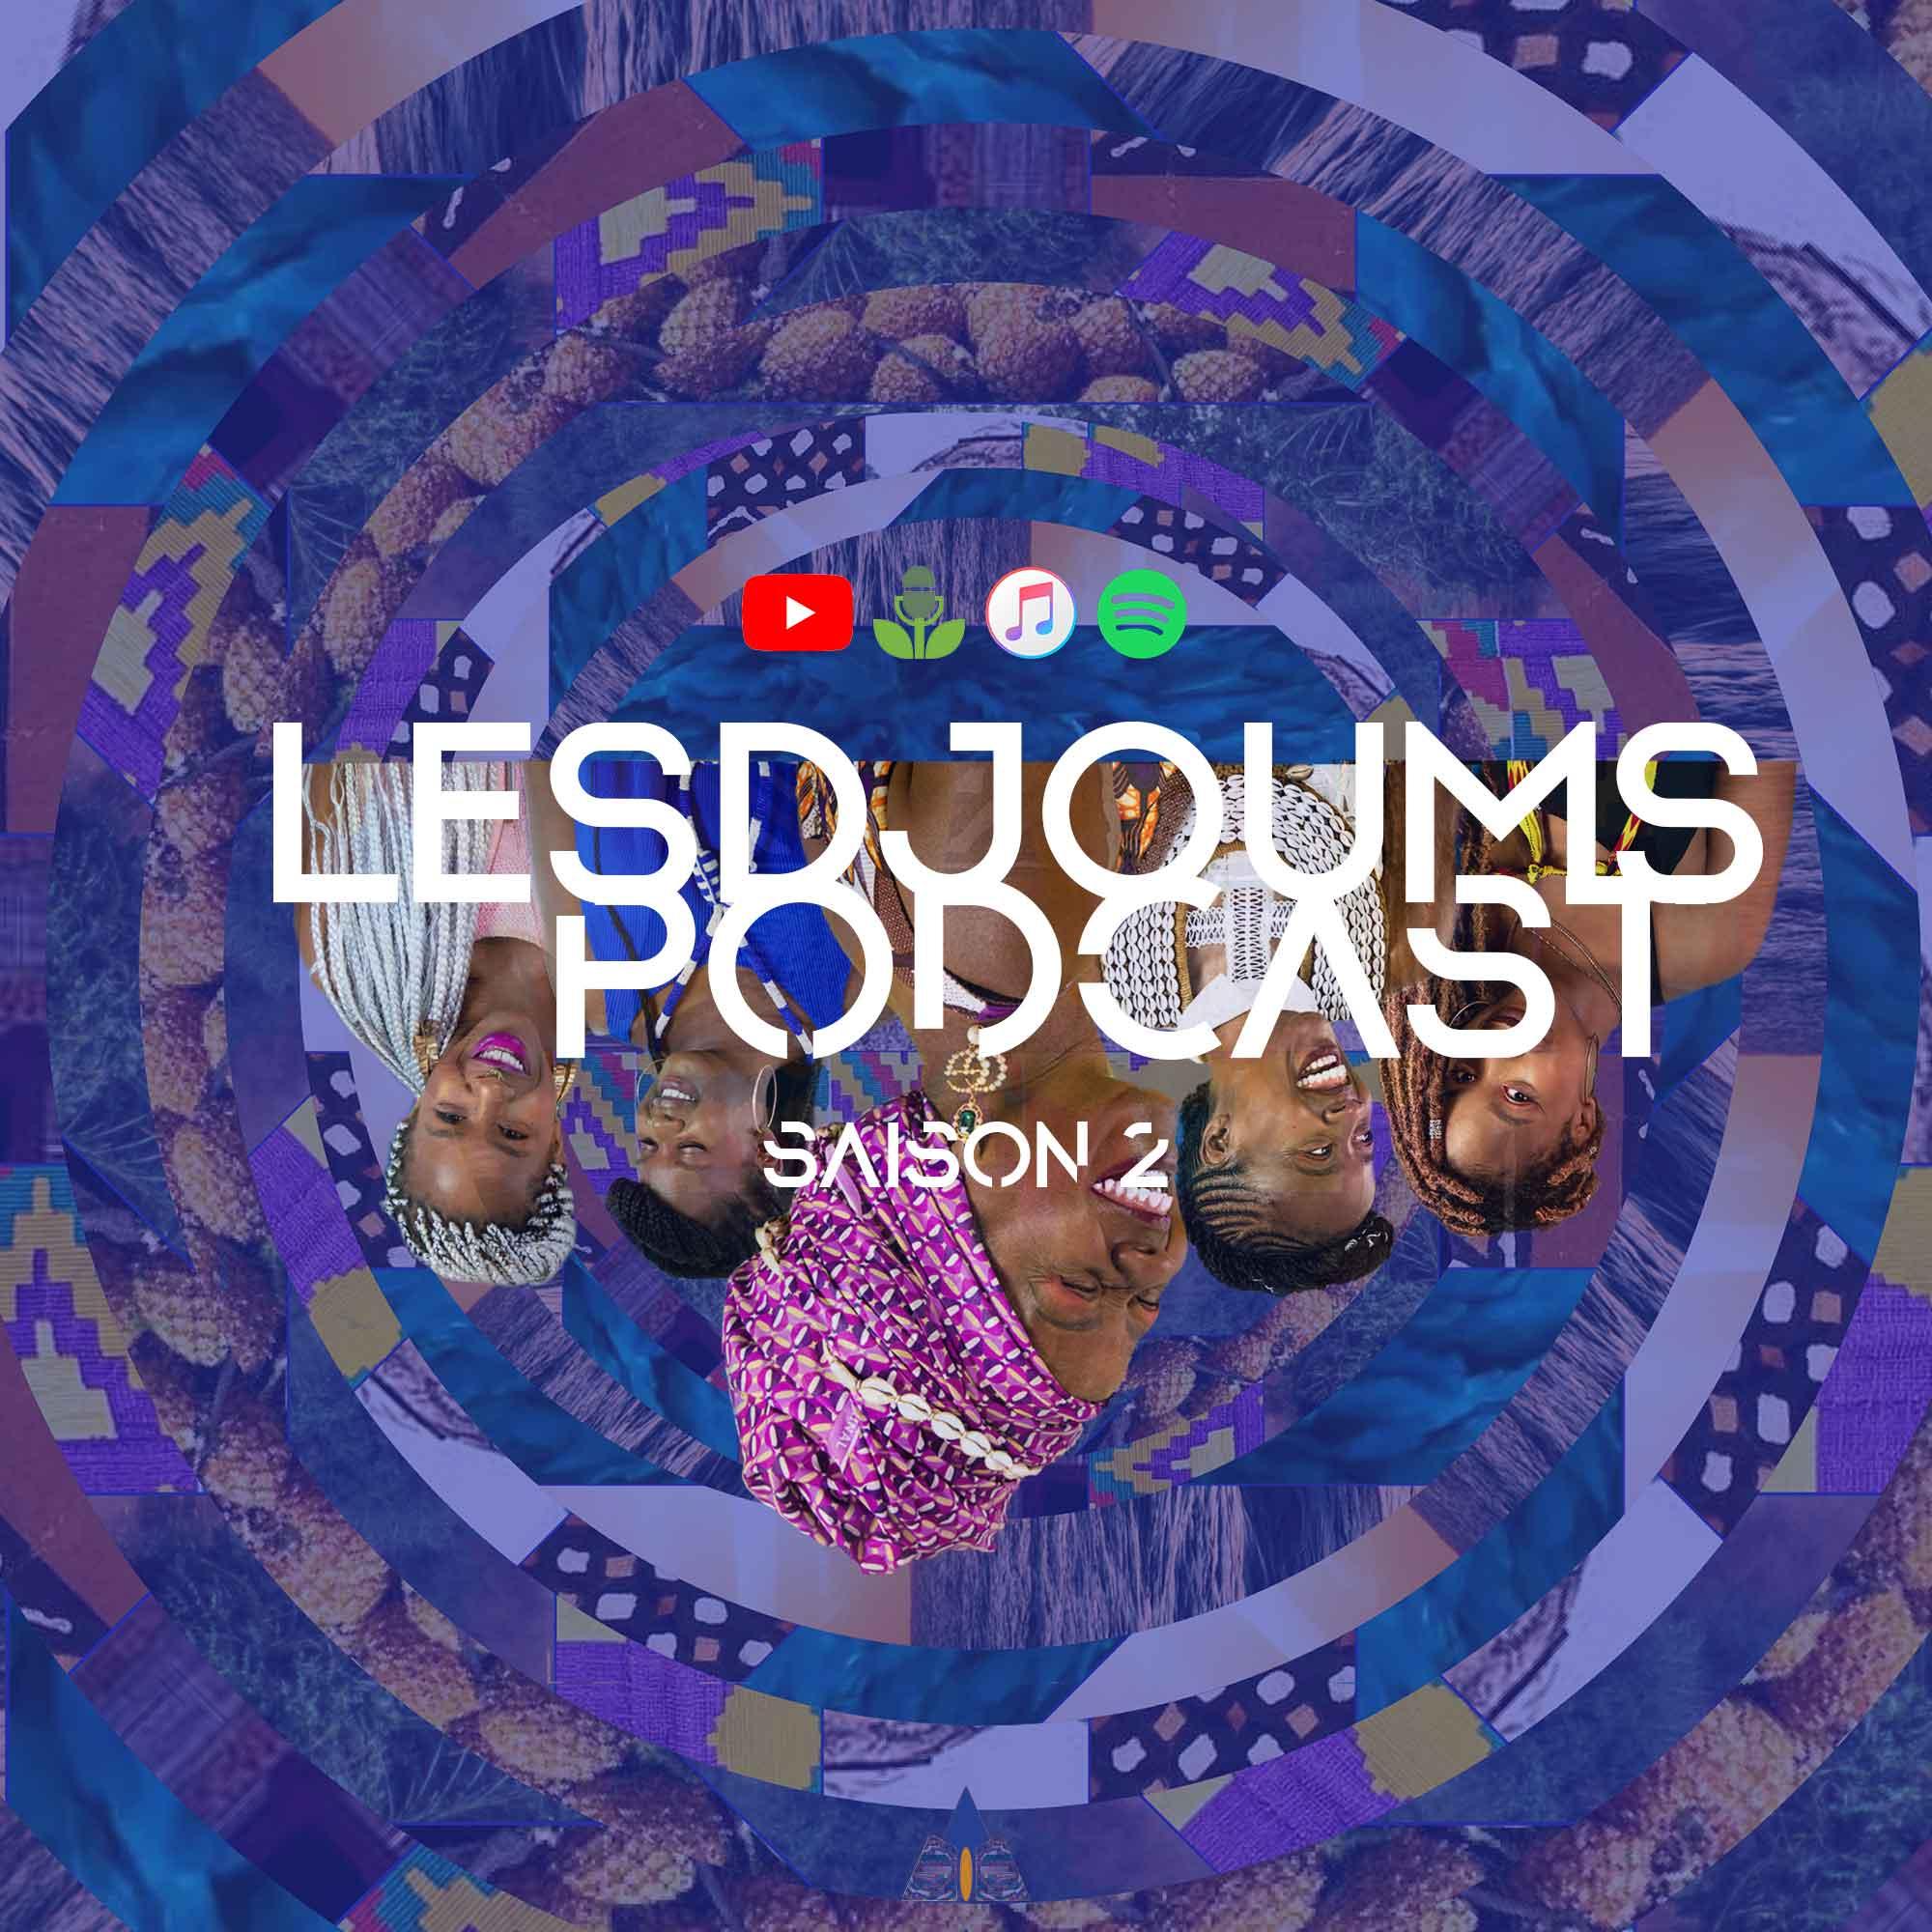 Vignette-LesDjoums-Season-2